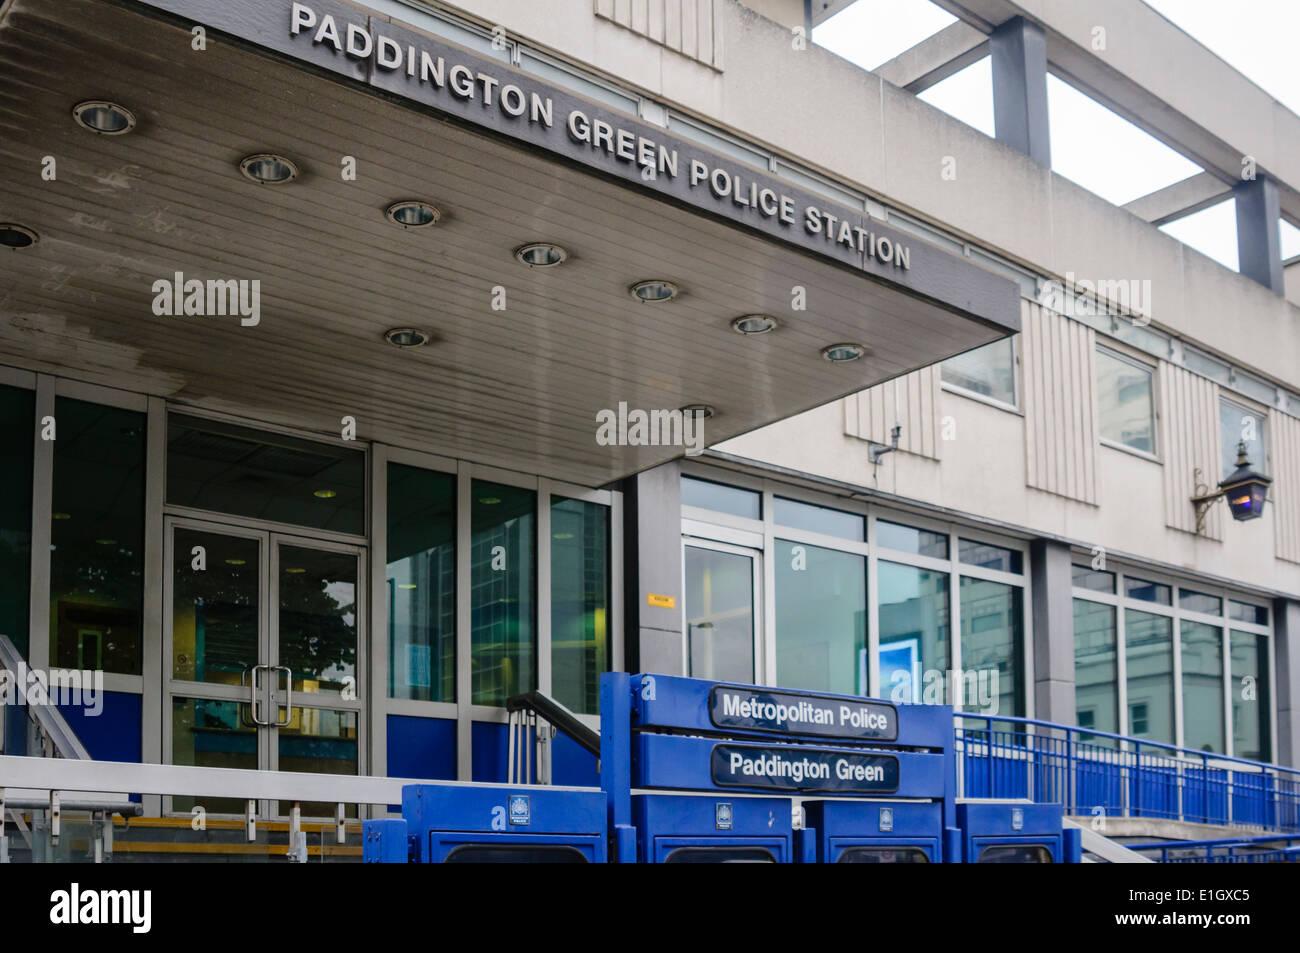 Paddington Green Metropolitan Police Station - Stock Image